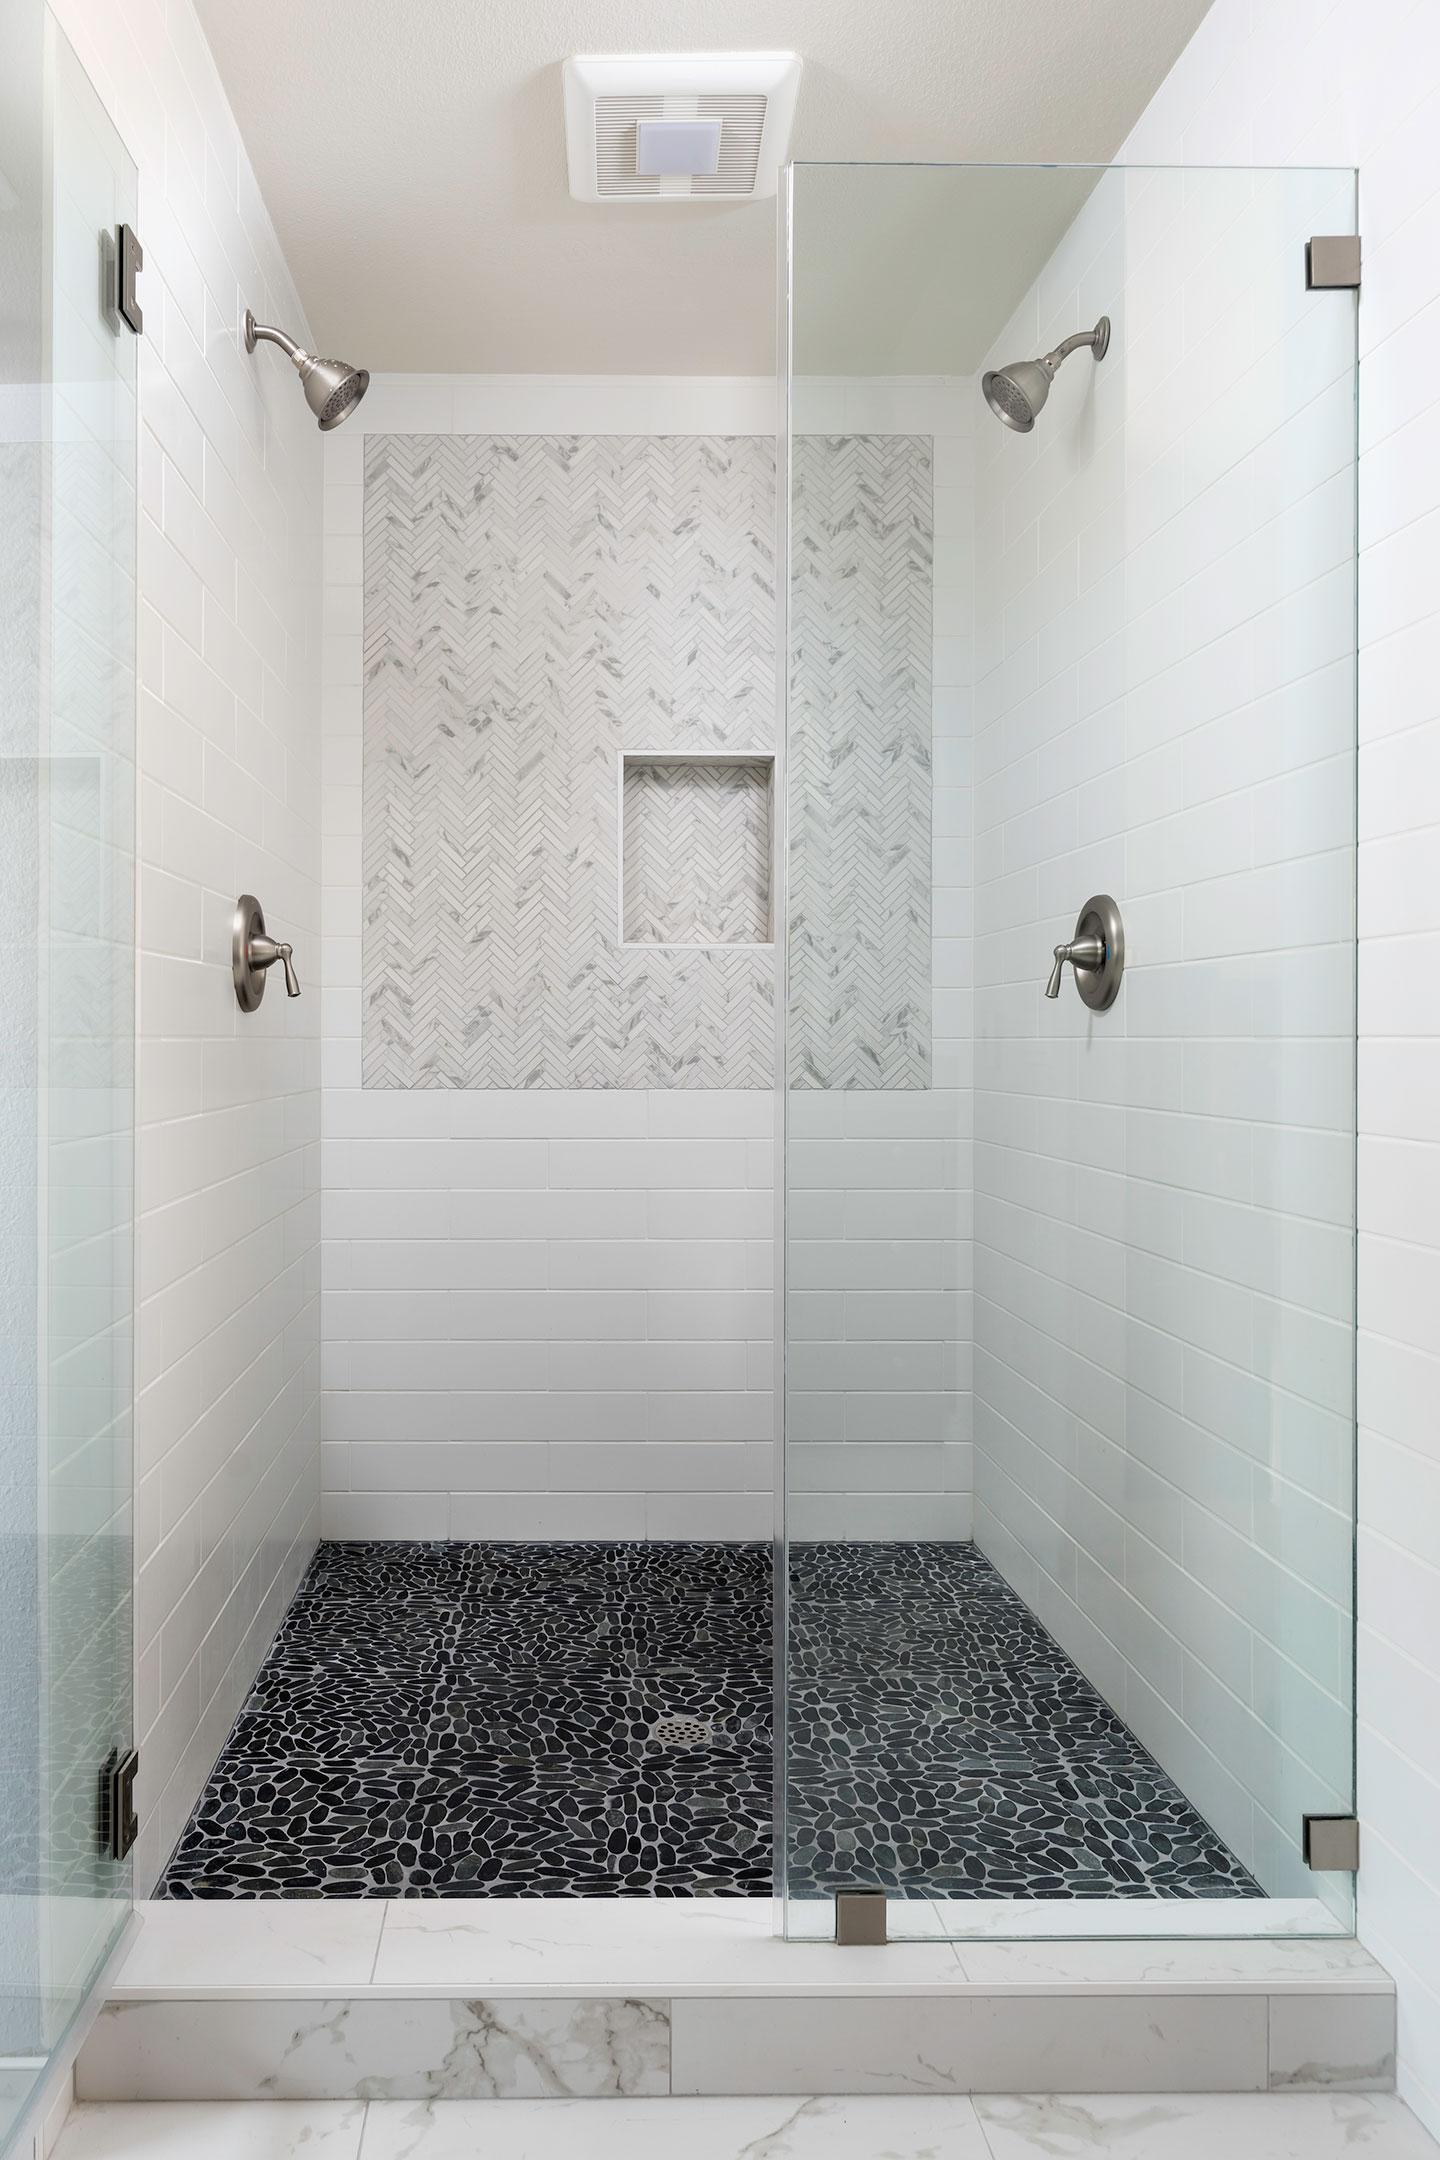 glass shower enclosure with black pebble floor